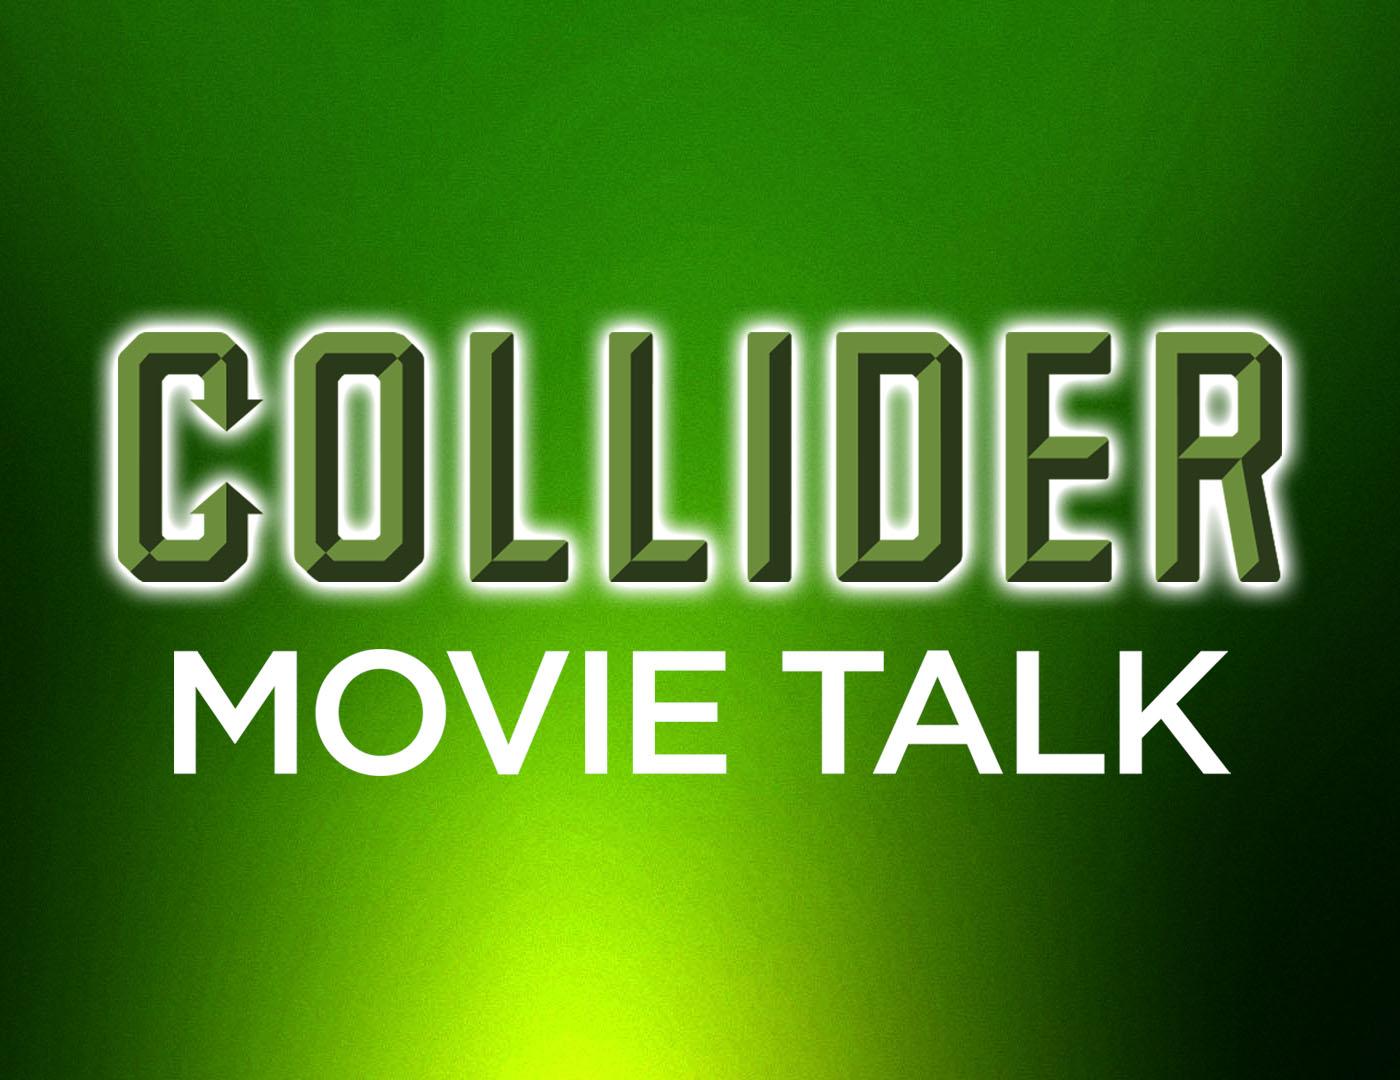 Movie Talk Reviews Rogue One - Collider Movie Talk